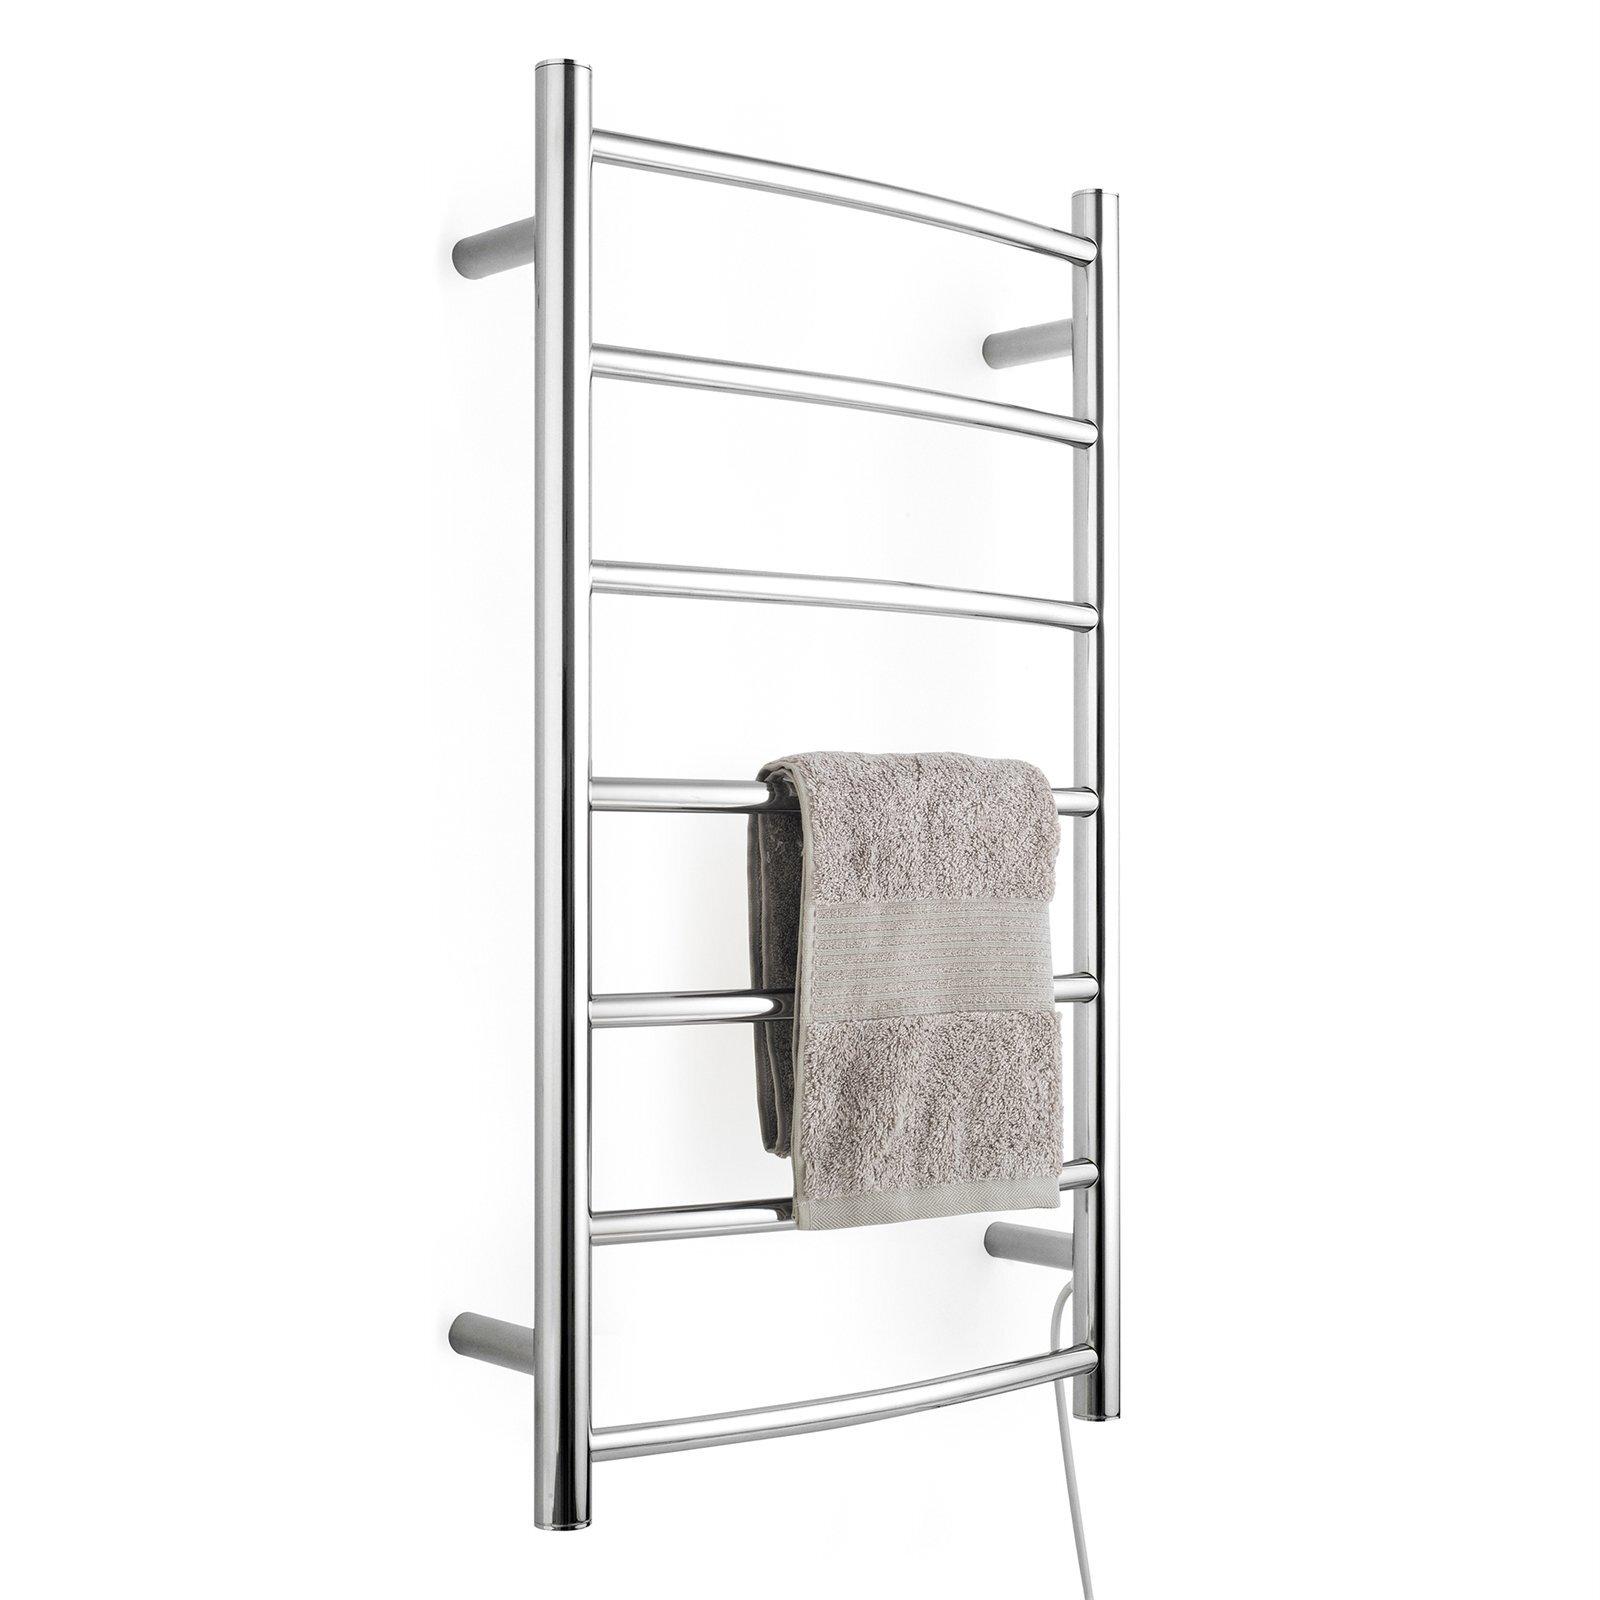 Arlec 7 Bar 65W Stainless Steel  Curved Heated Towel Rail